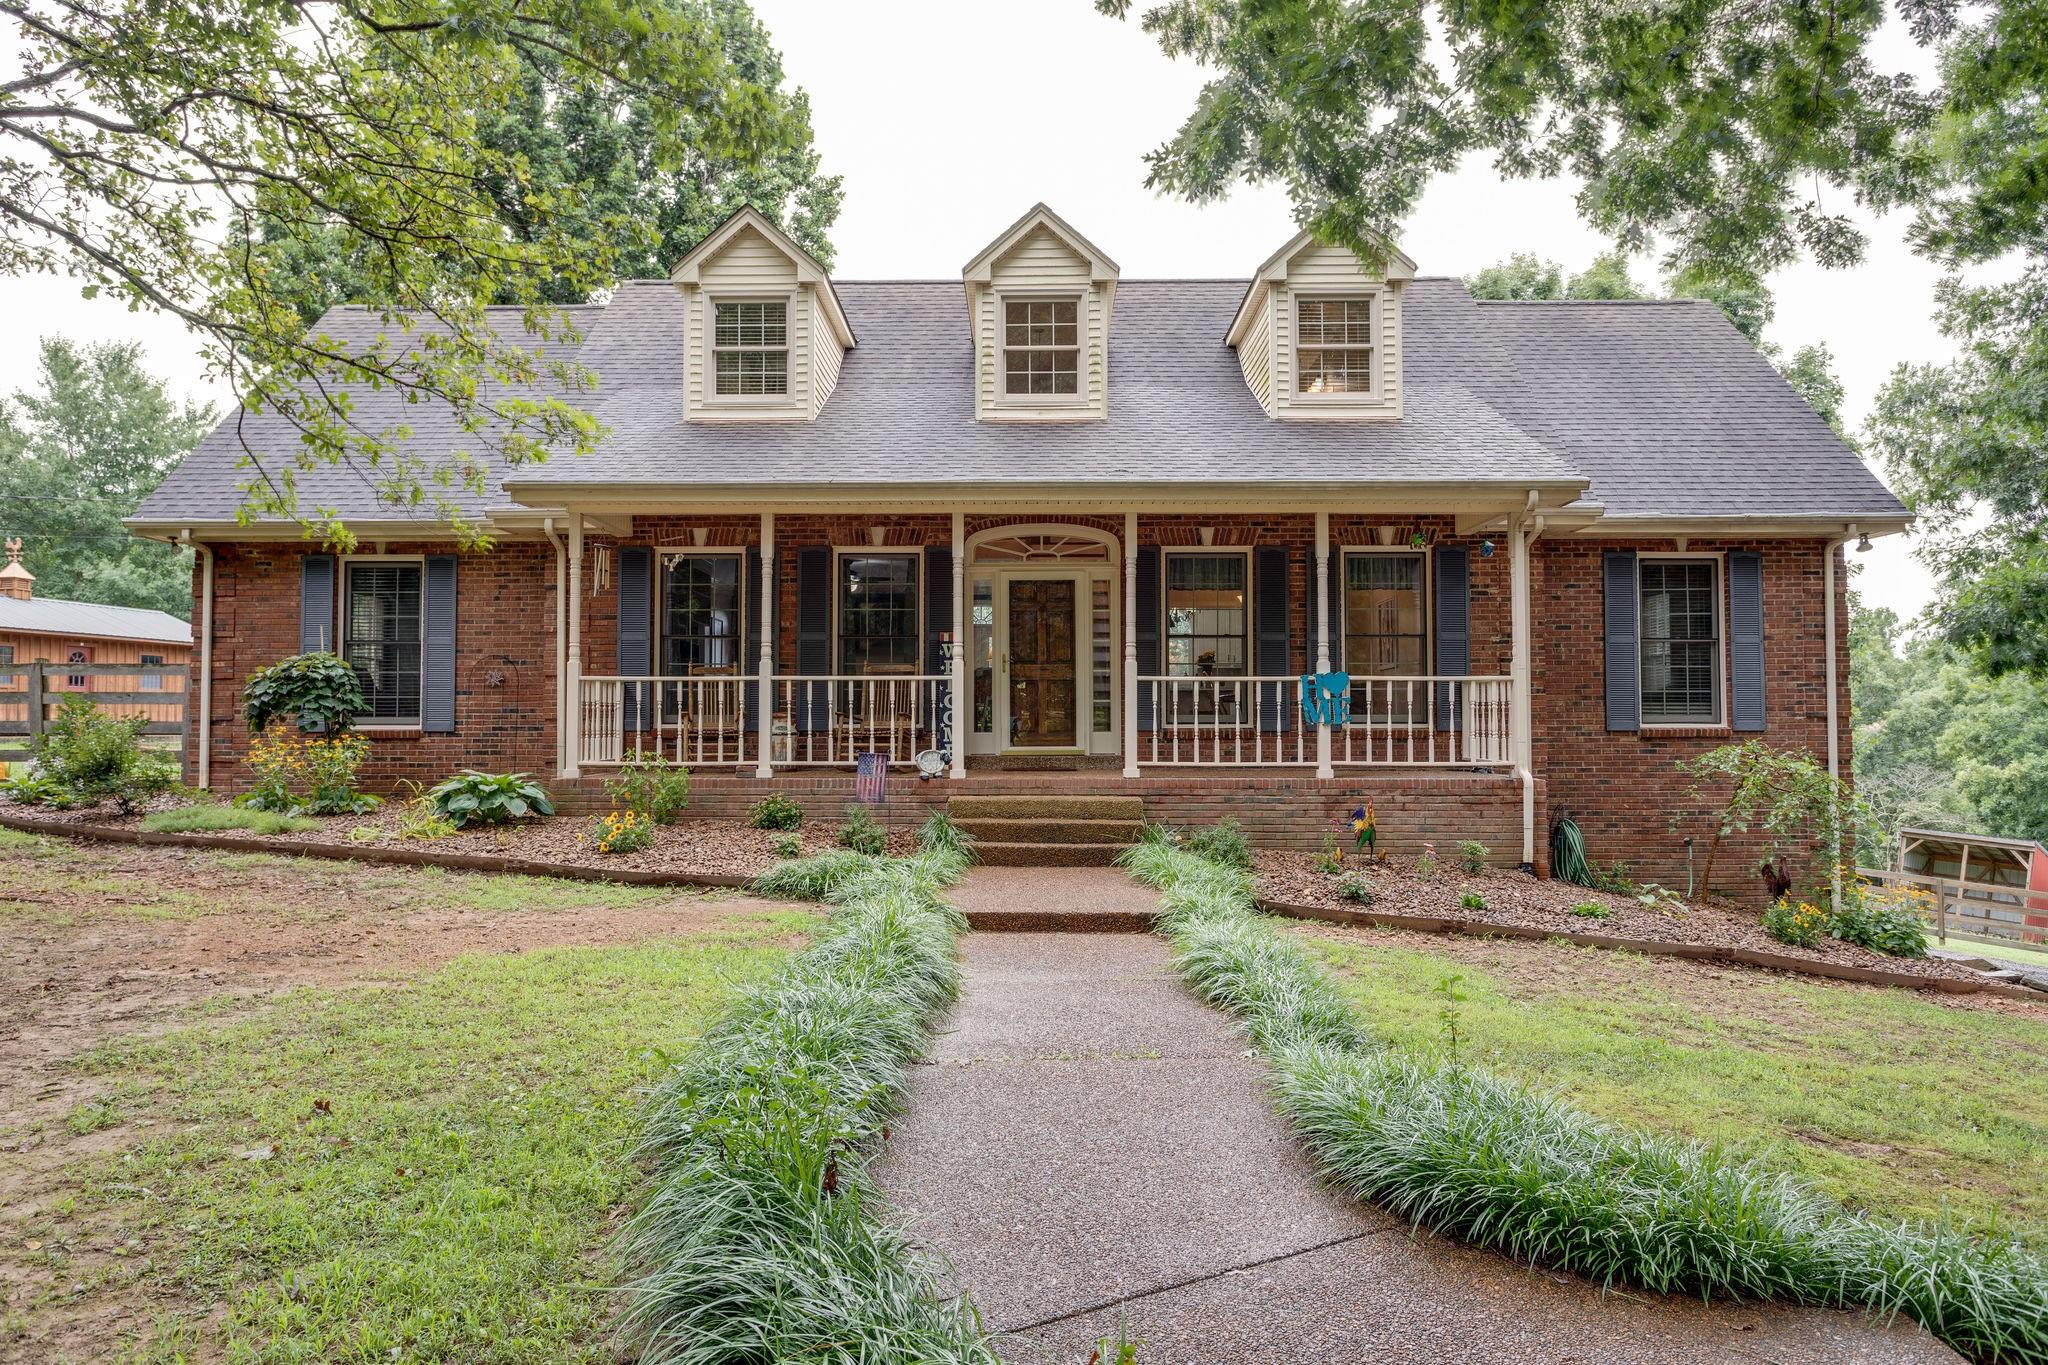 2875 Fairview Blvd, Fairview, TN 37062 - Fairview, TN real estate listing